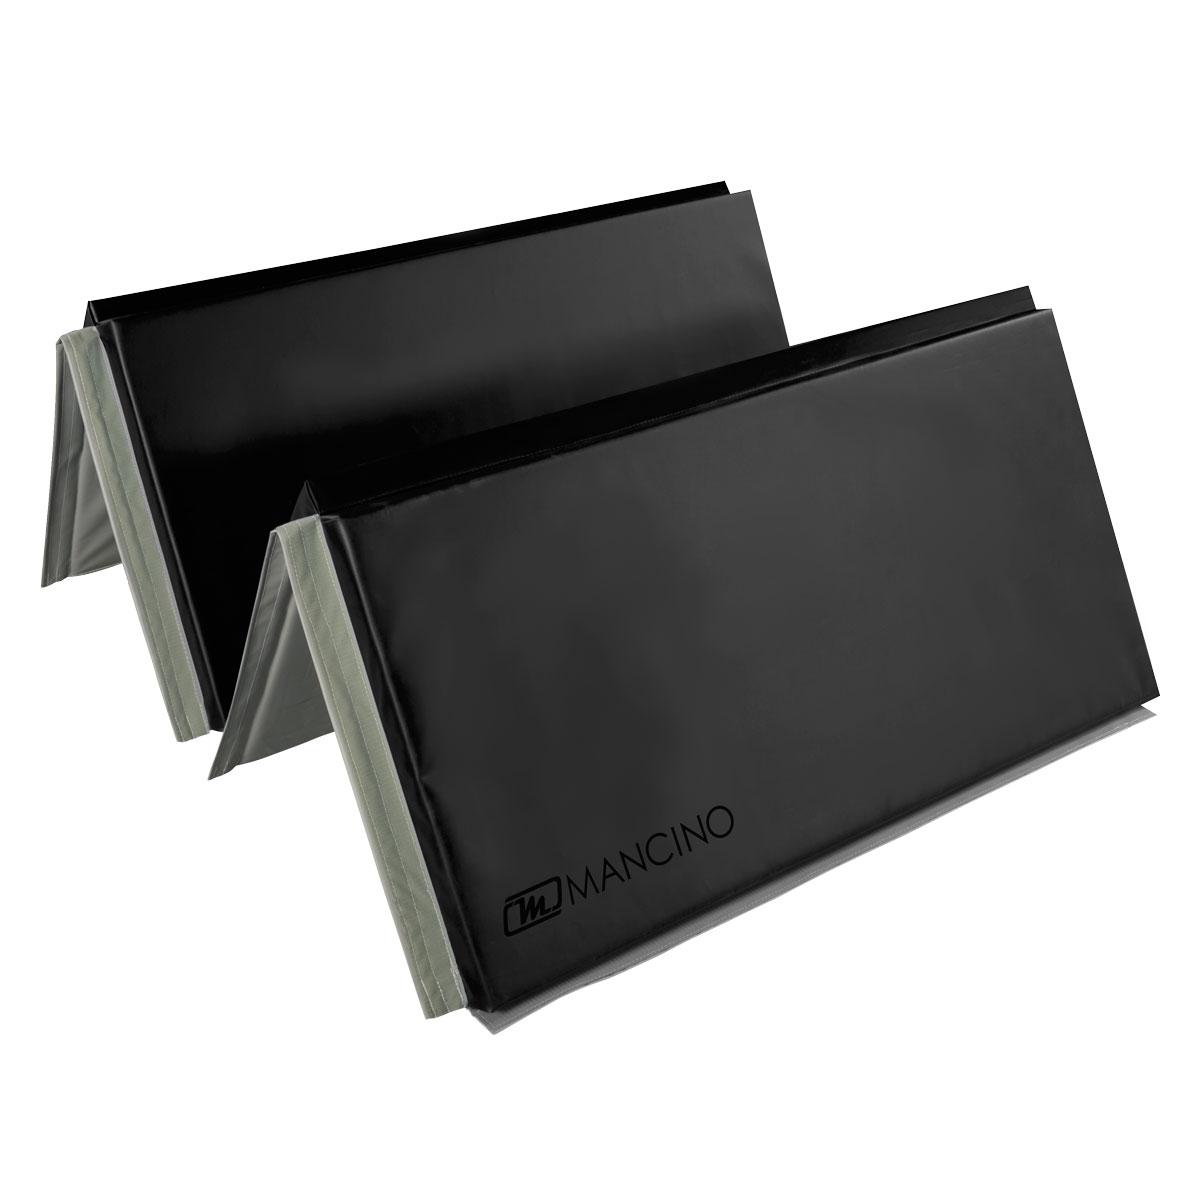 thick folding panel mat for stunts and fall work by stuntmen and stunwomen -  mancino mats